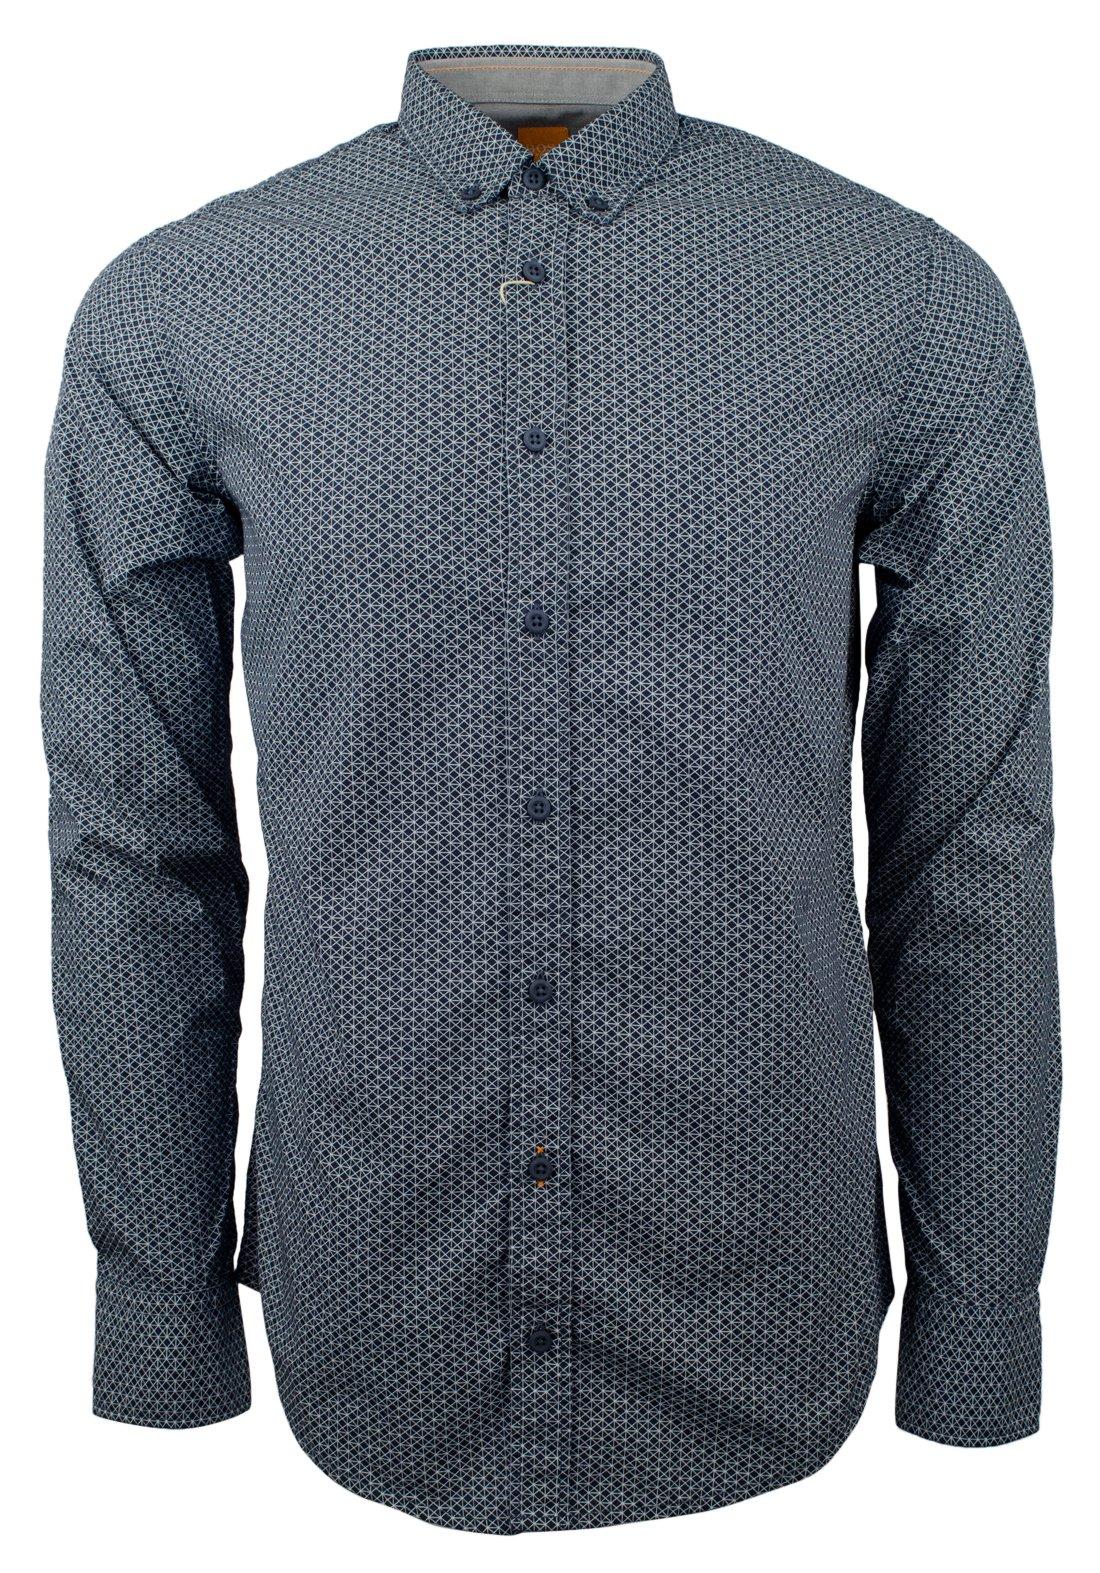 Hugo Boss Men's Orange Label EdipoE Slim Fit Geometric Cotton Shirt-NB-M